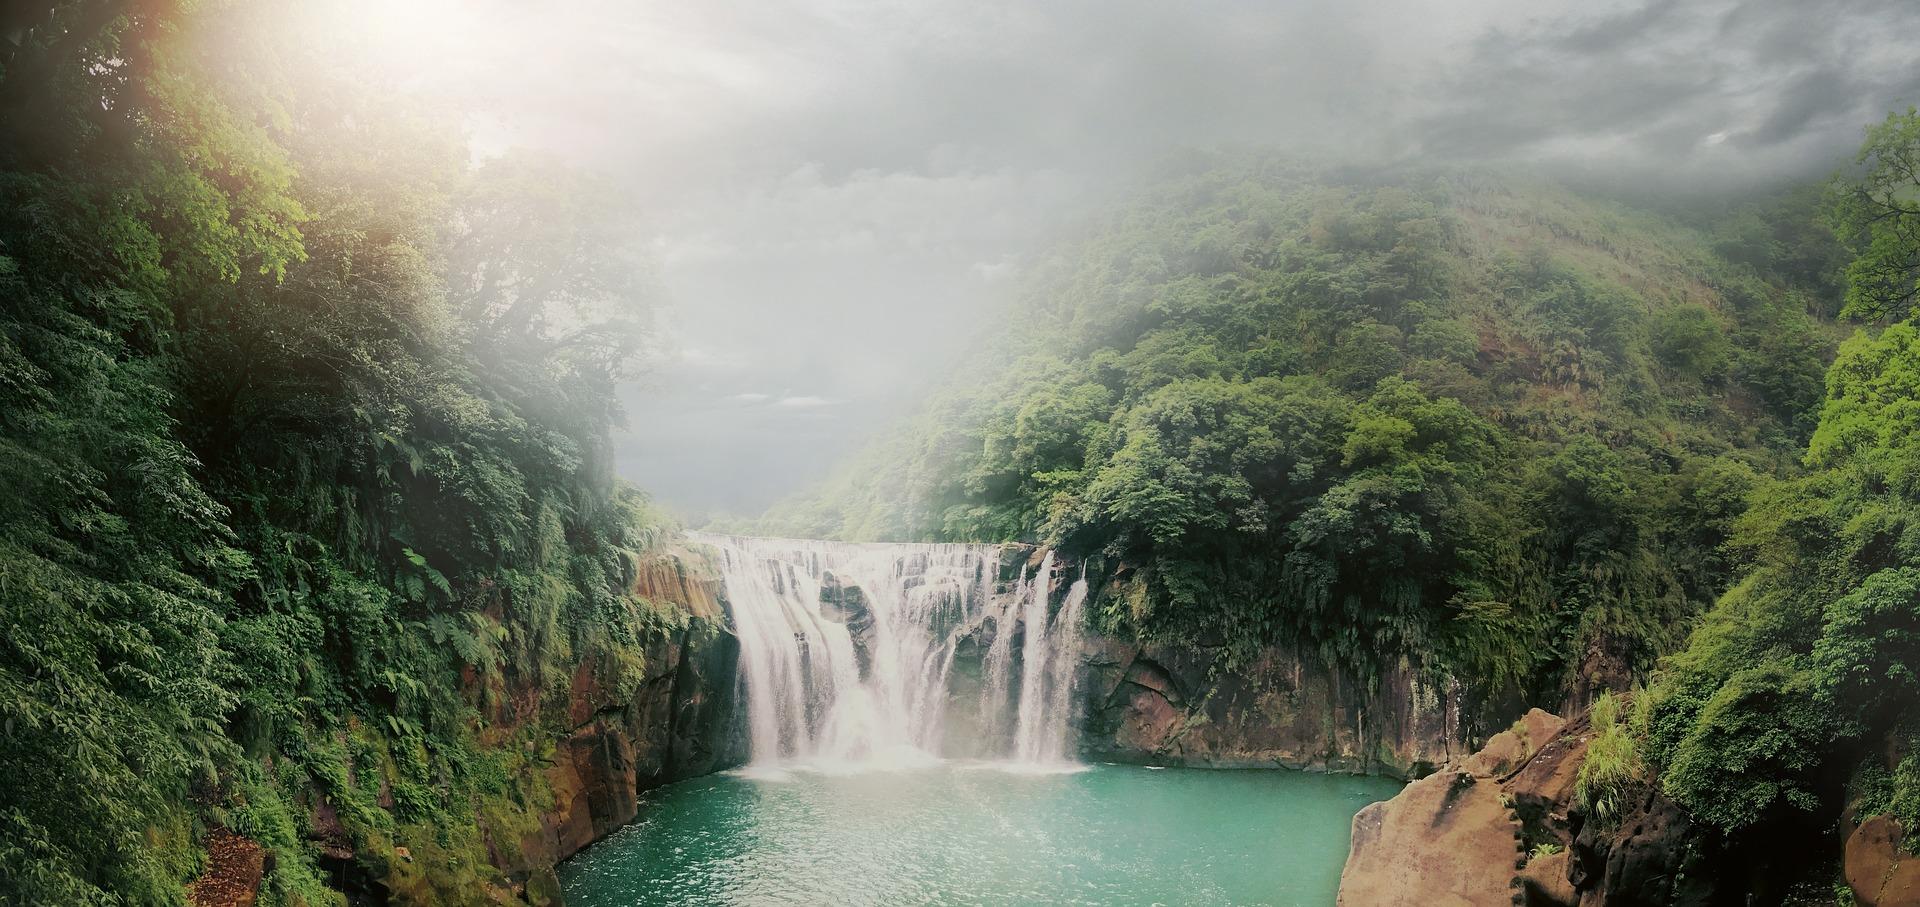 Selva africa